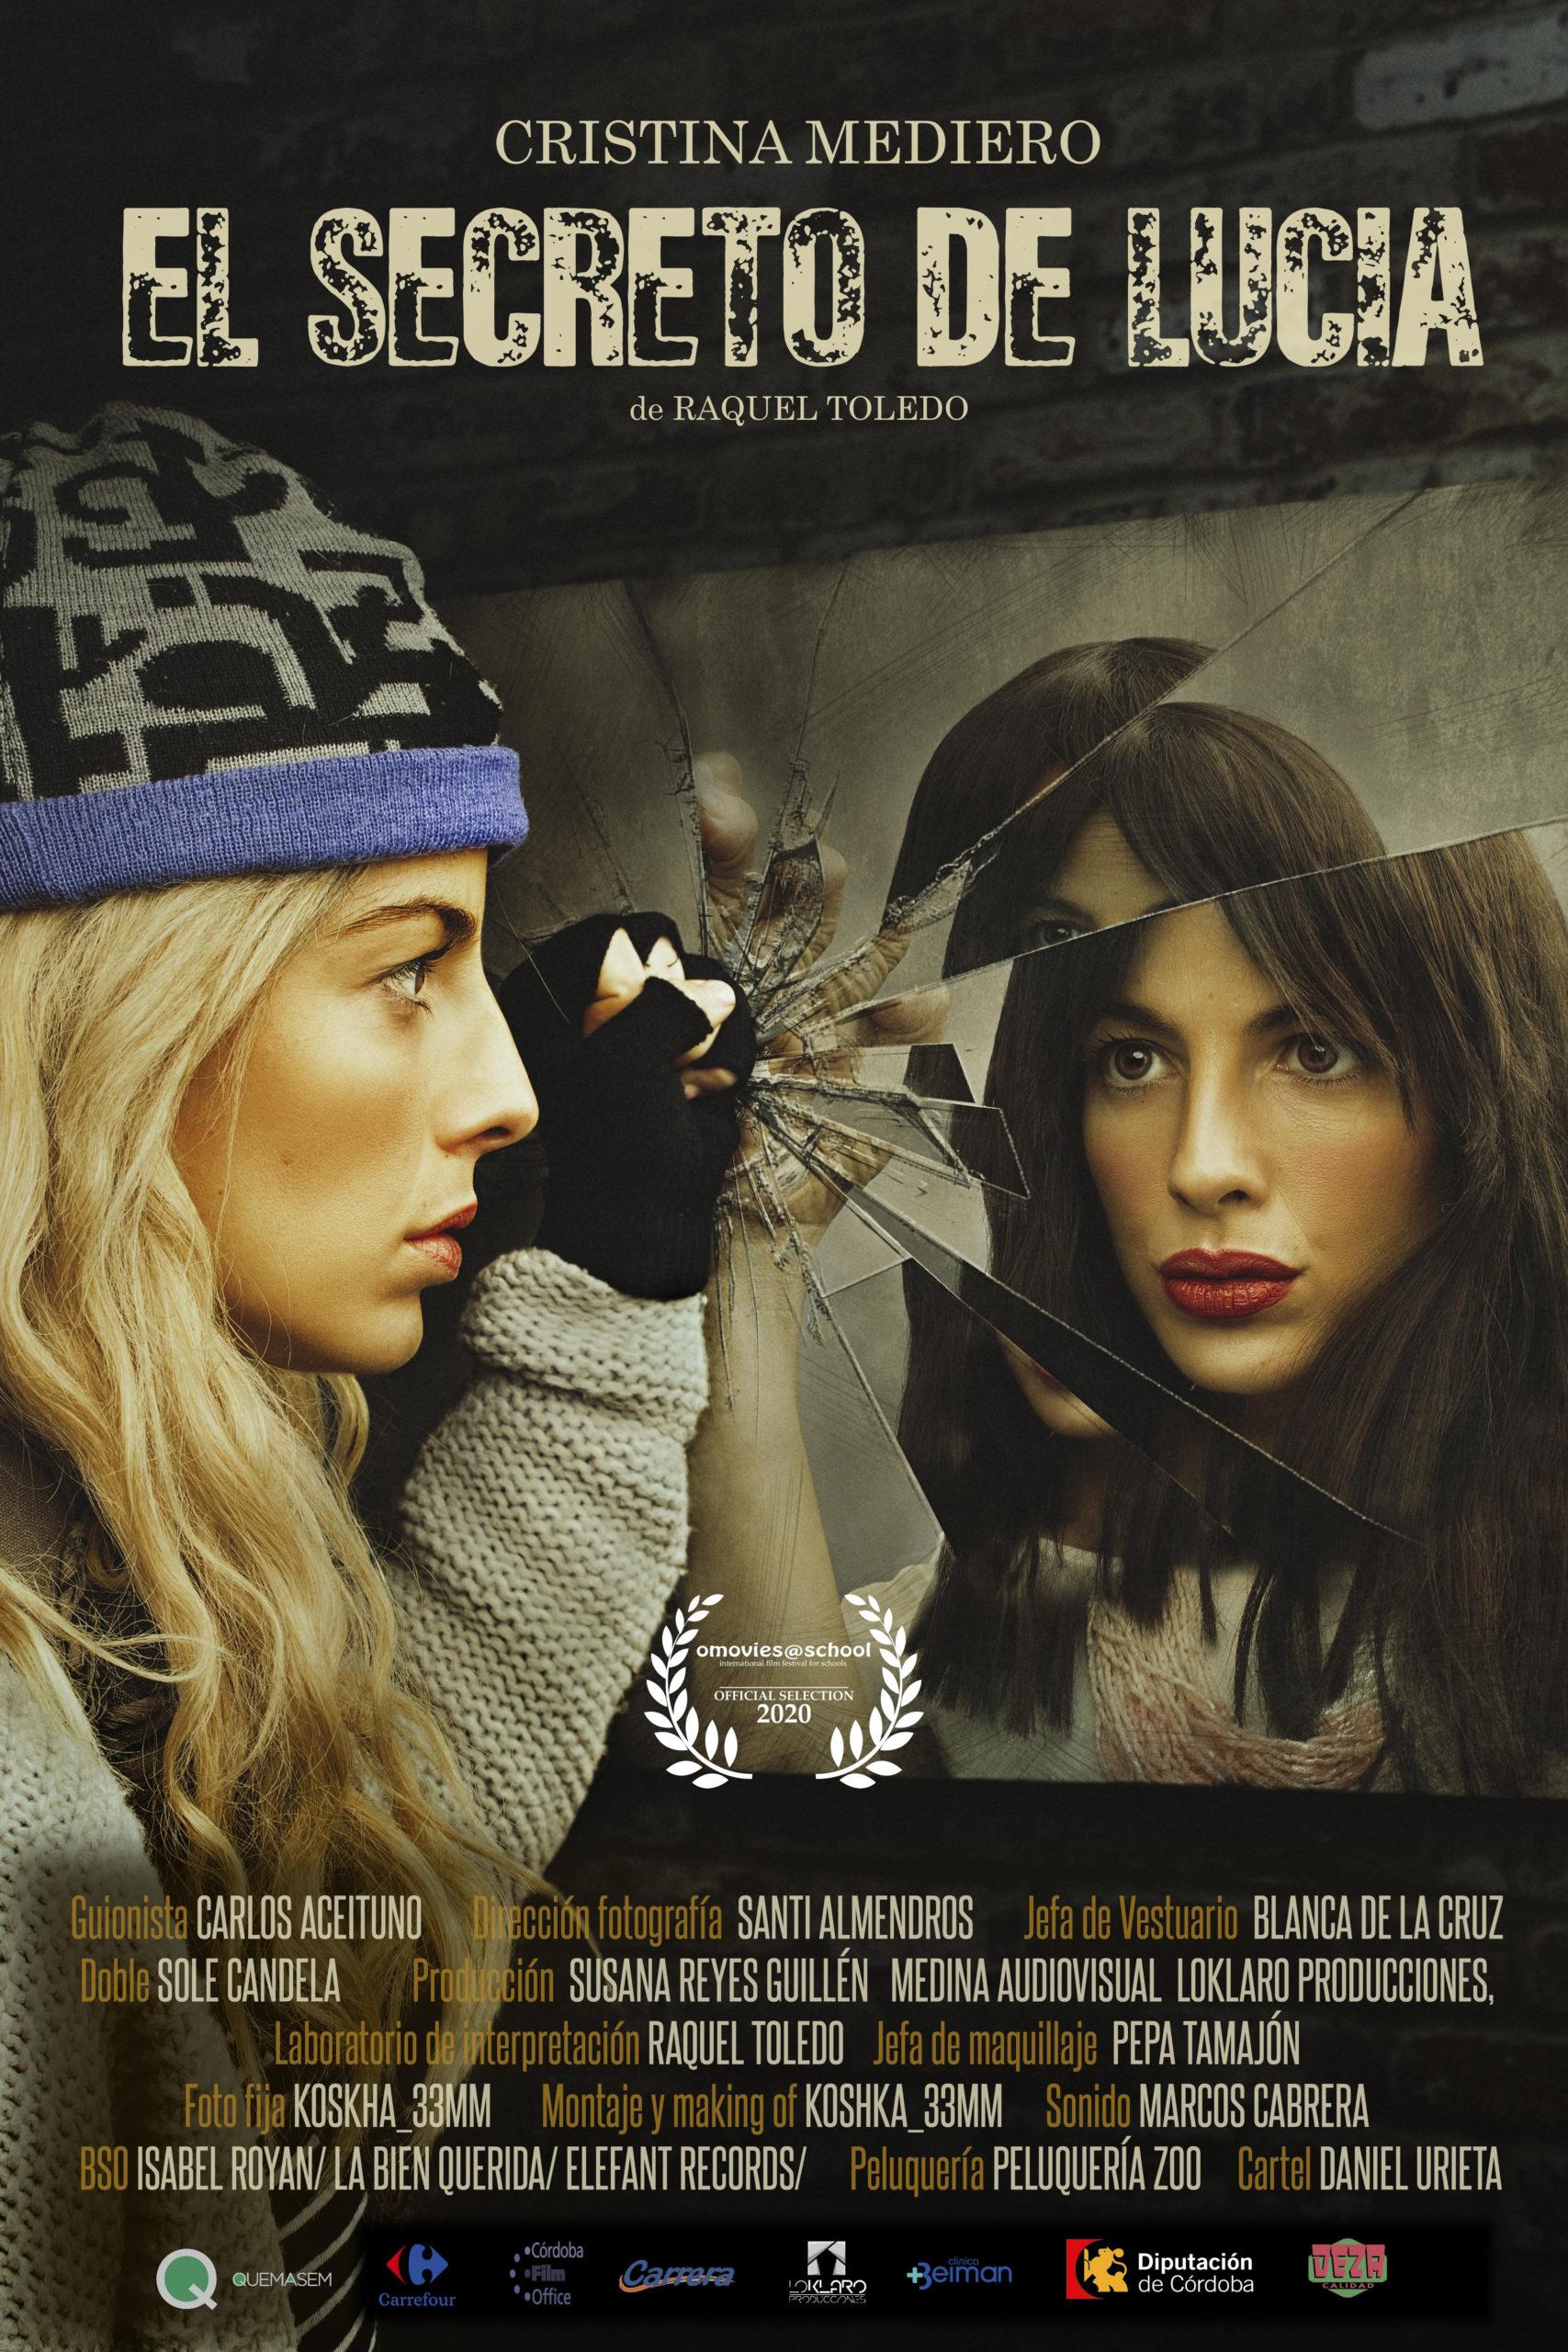 Omovies@school Film selezionati VOL.6